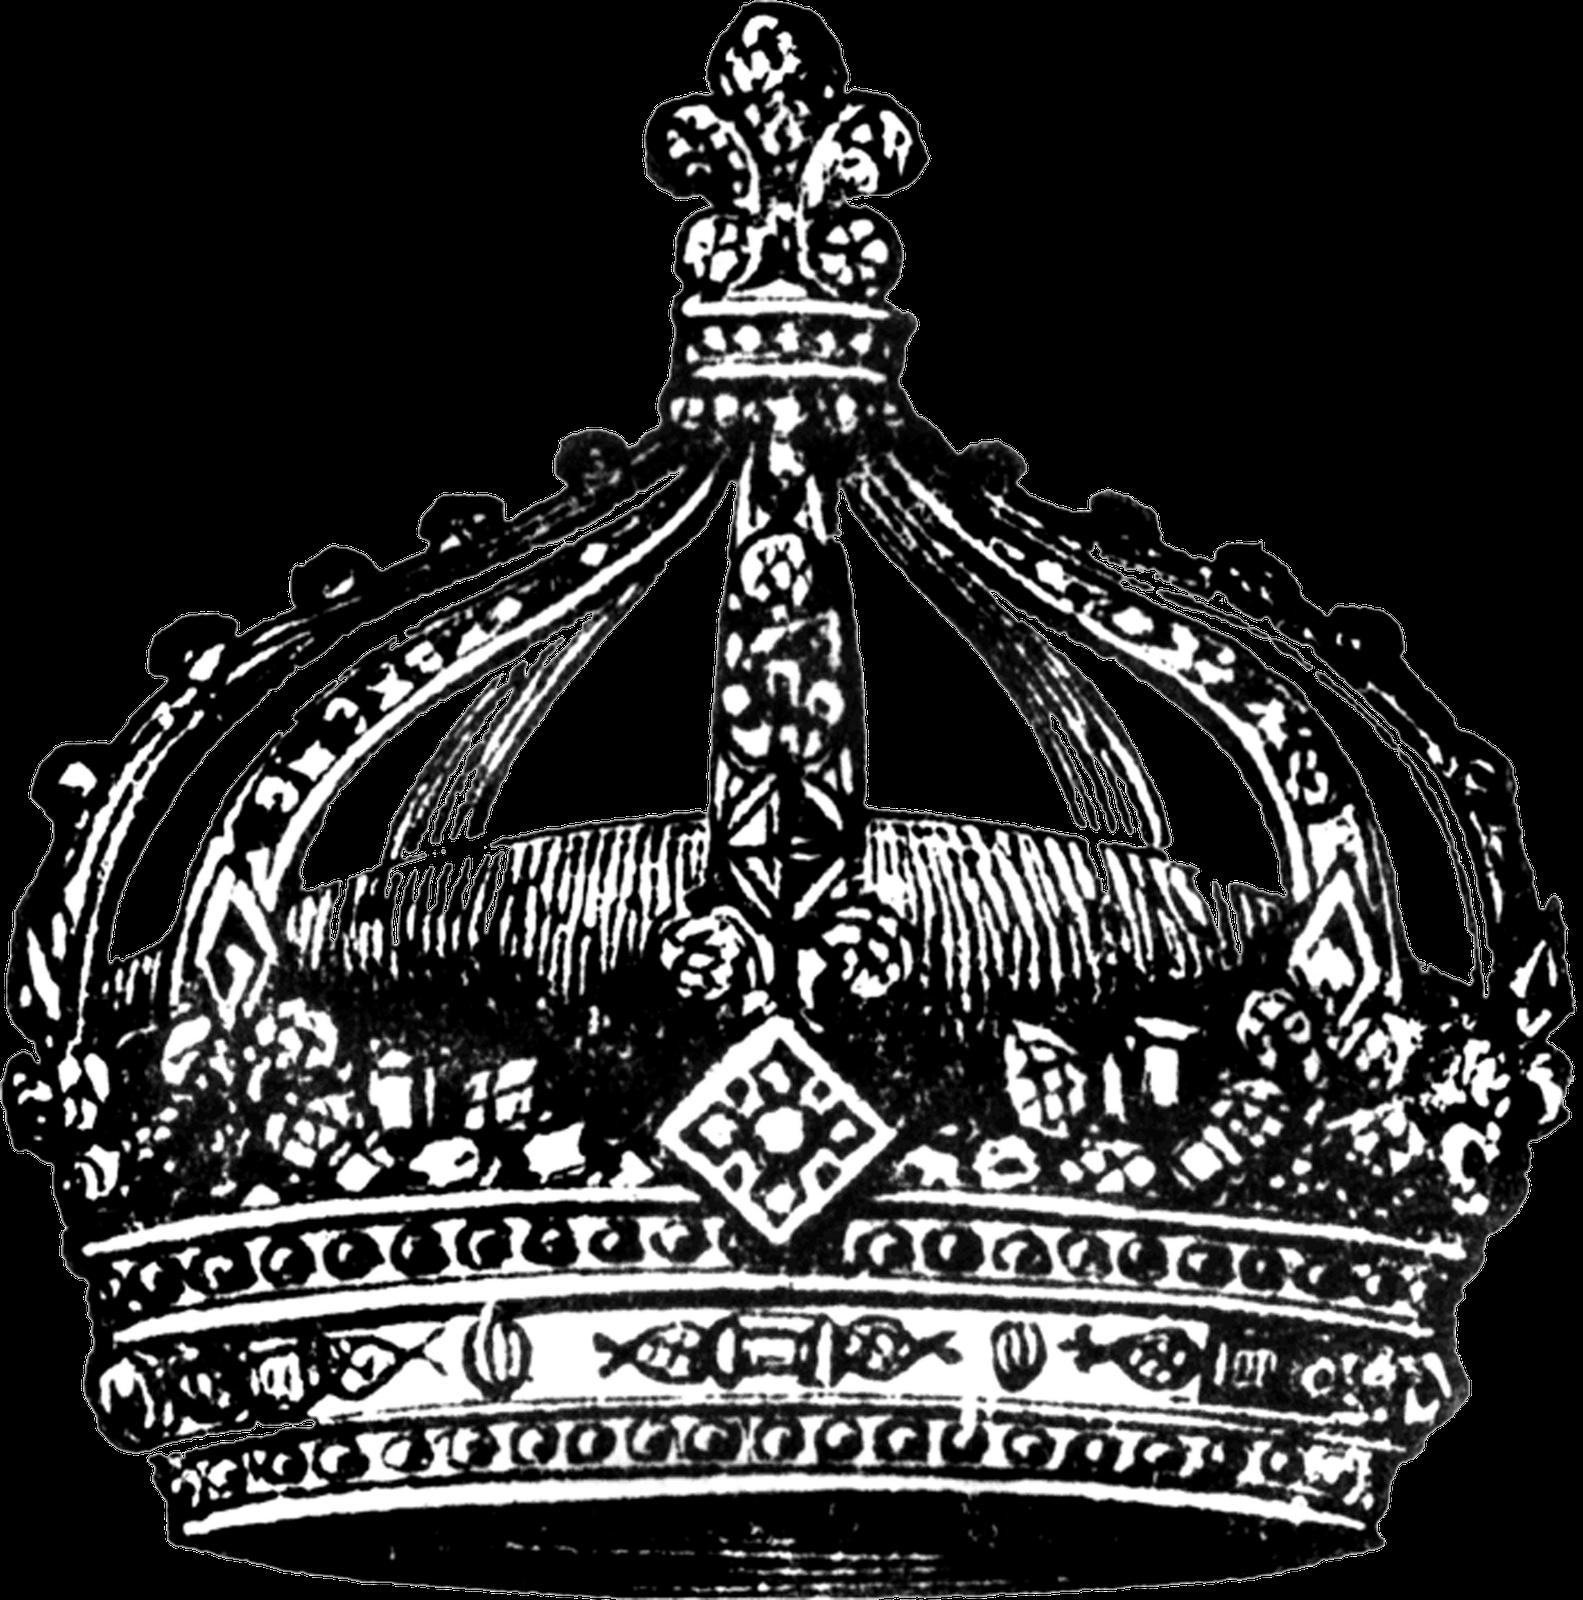 Black crown transparent background - photo#4